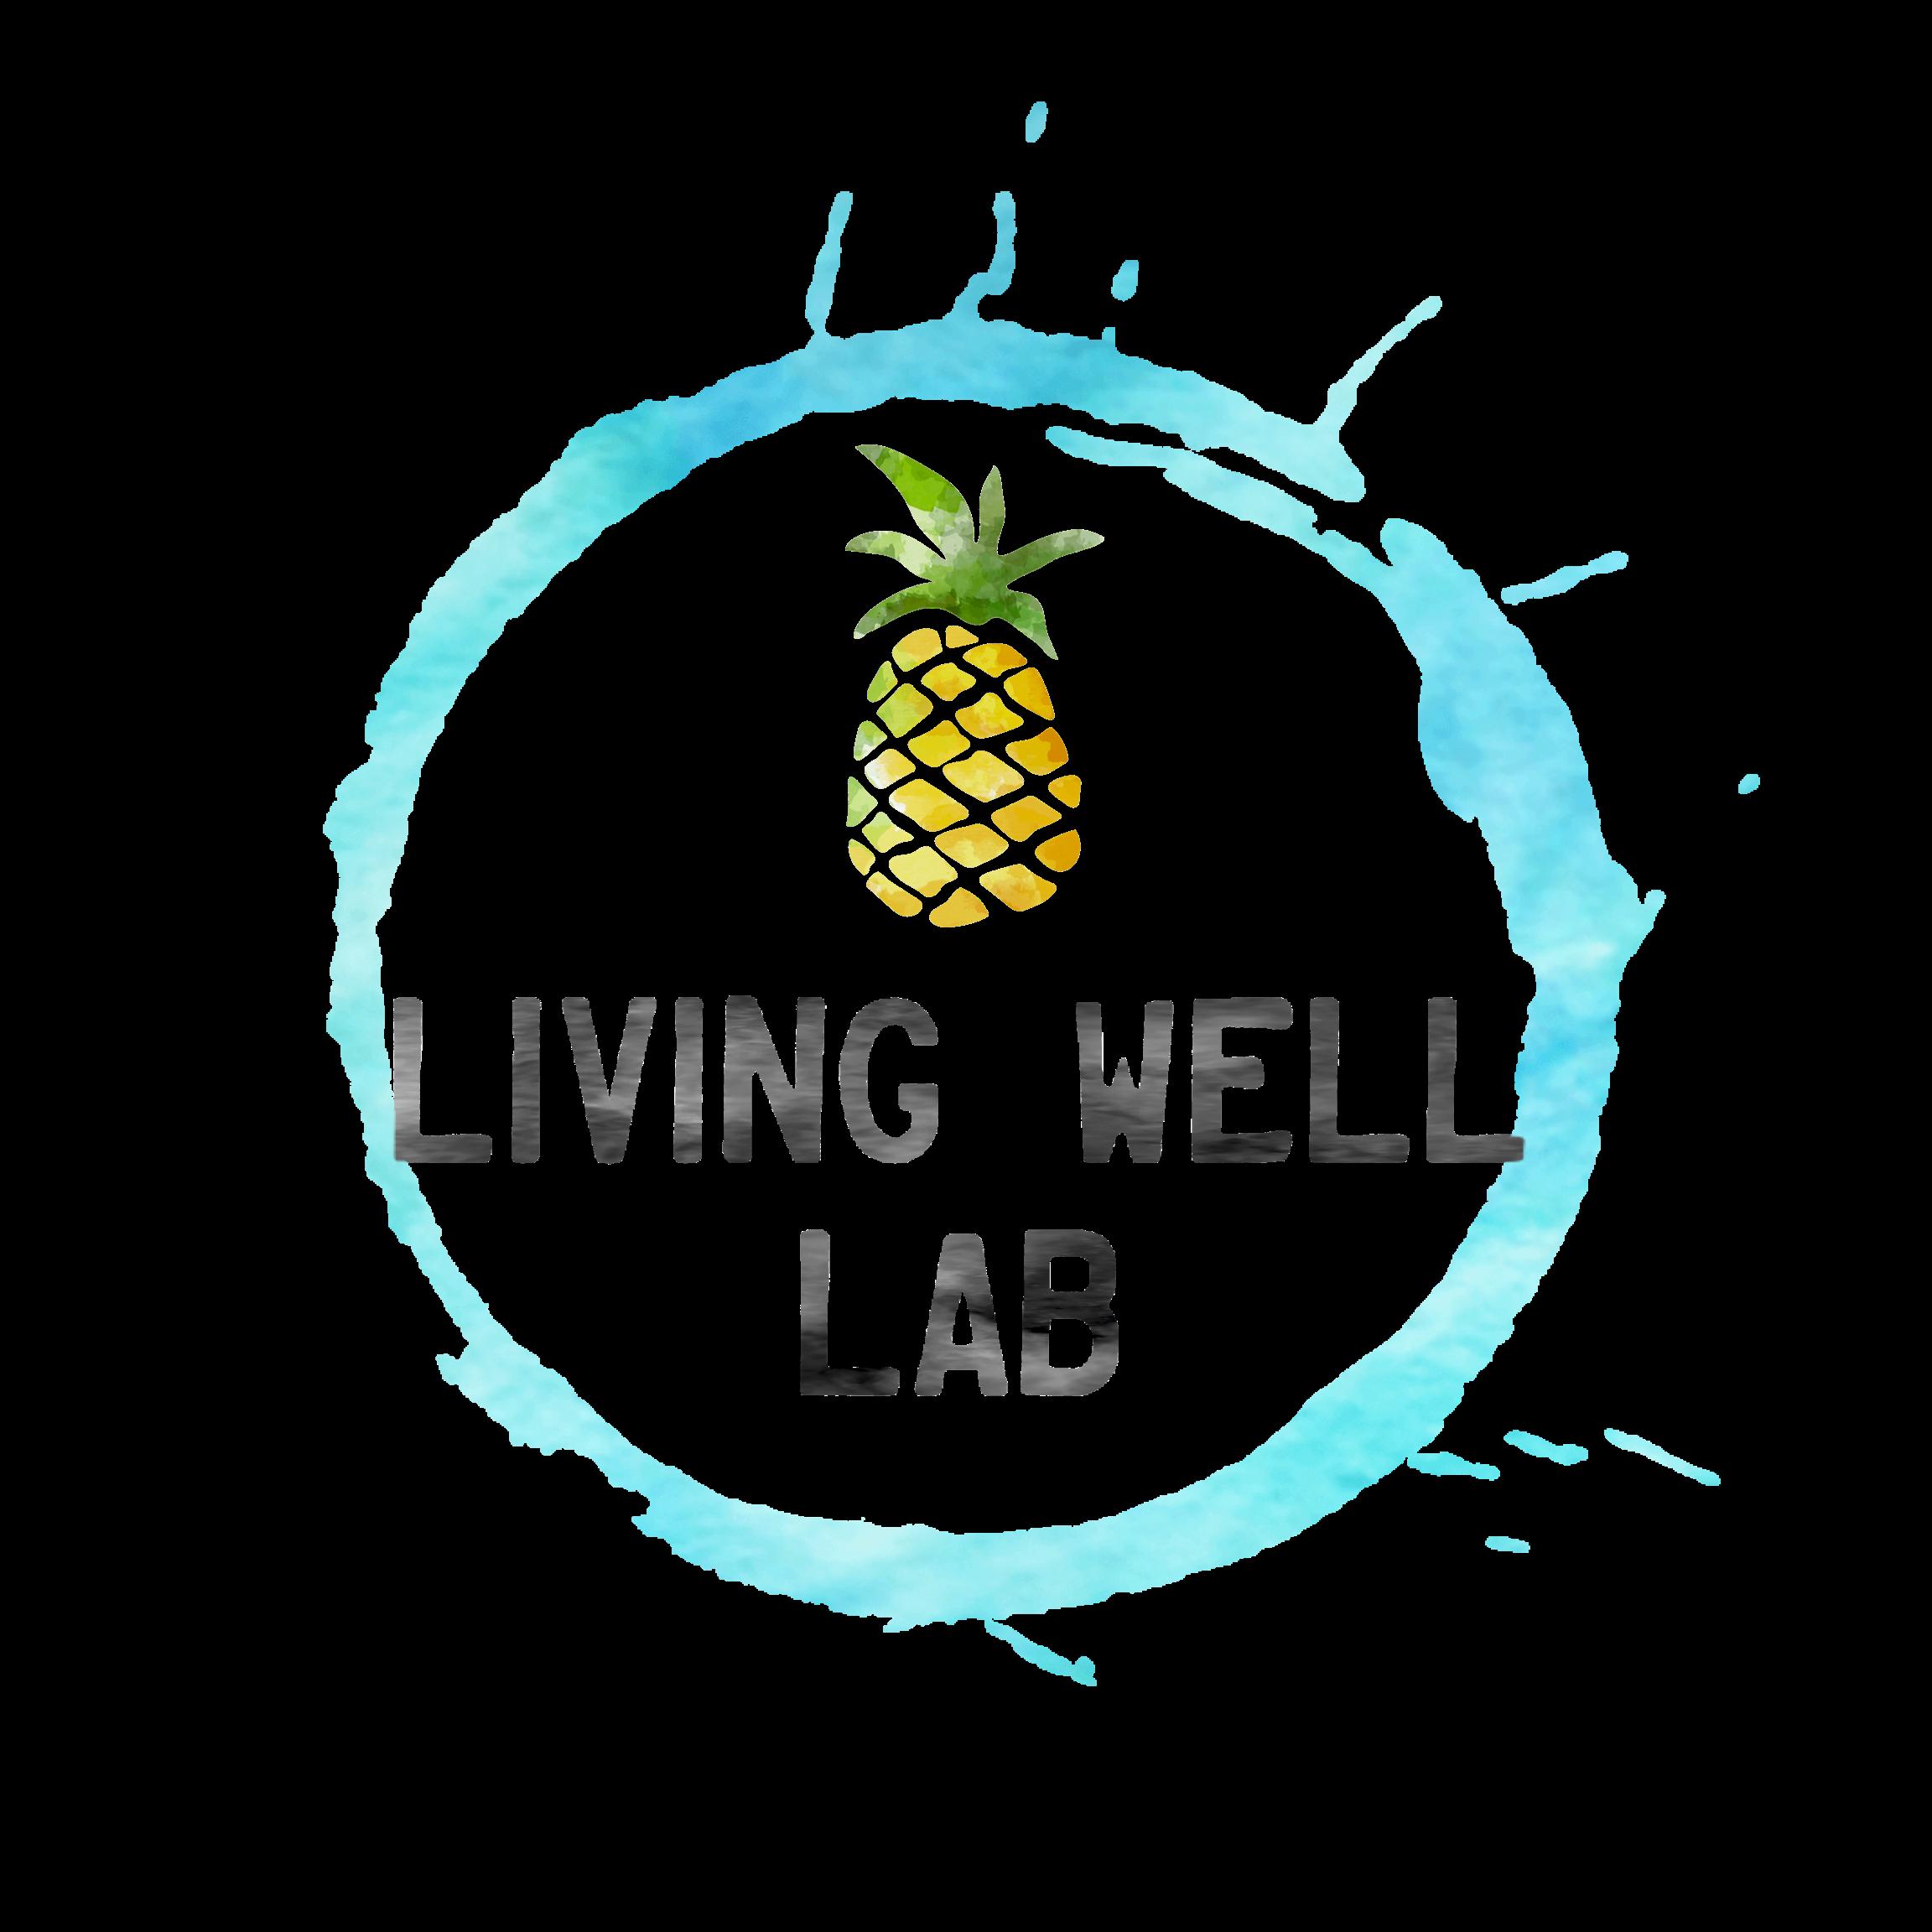 Living well lab logo